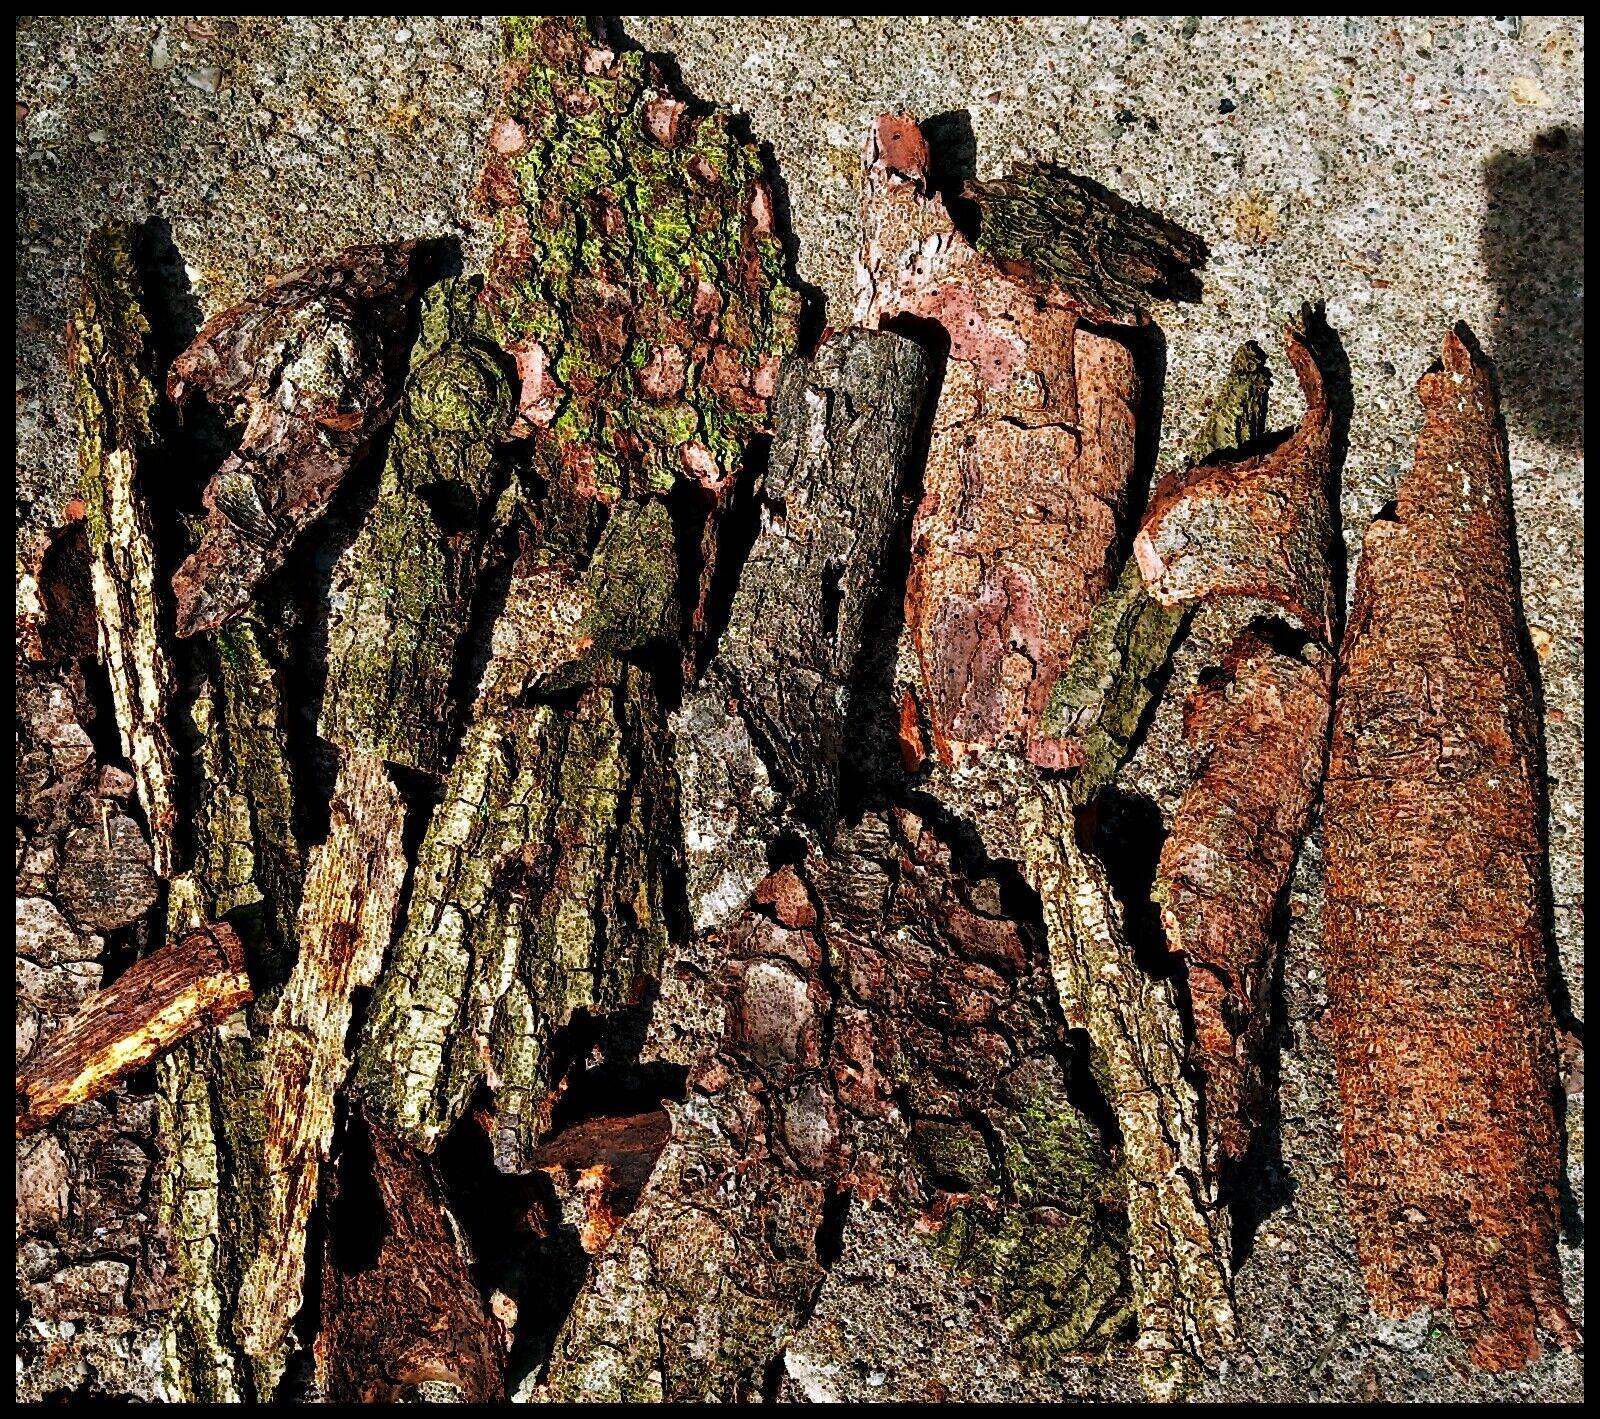 200g Pinienrinde Maritima Baumrinde natur Naturdeko Rinde Tischdeko